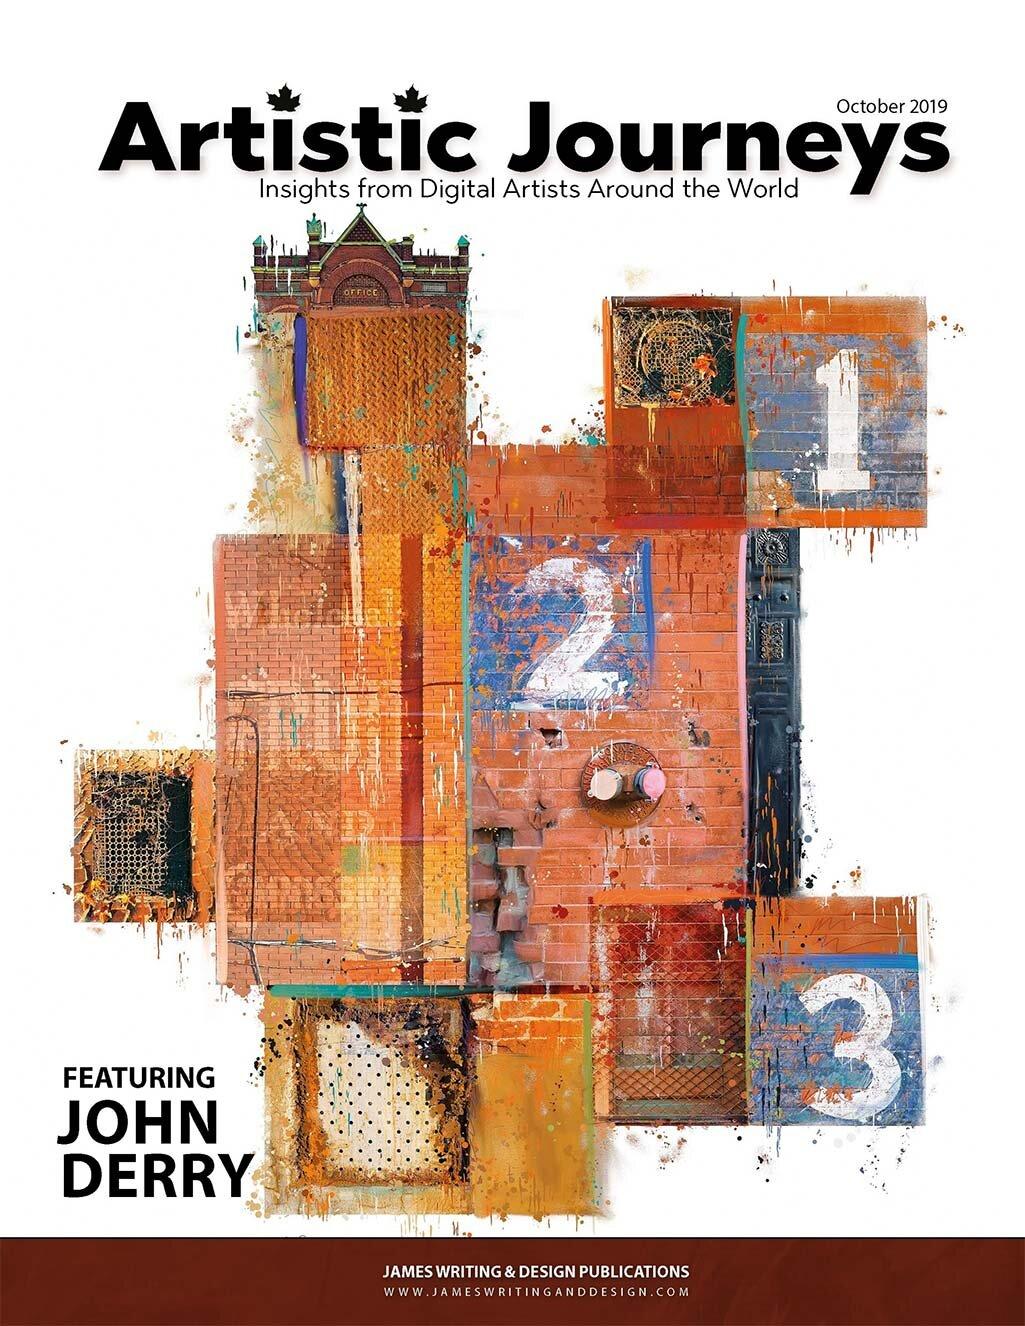 Artistic Journeys: John Derry